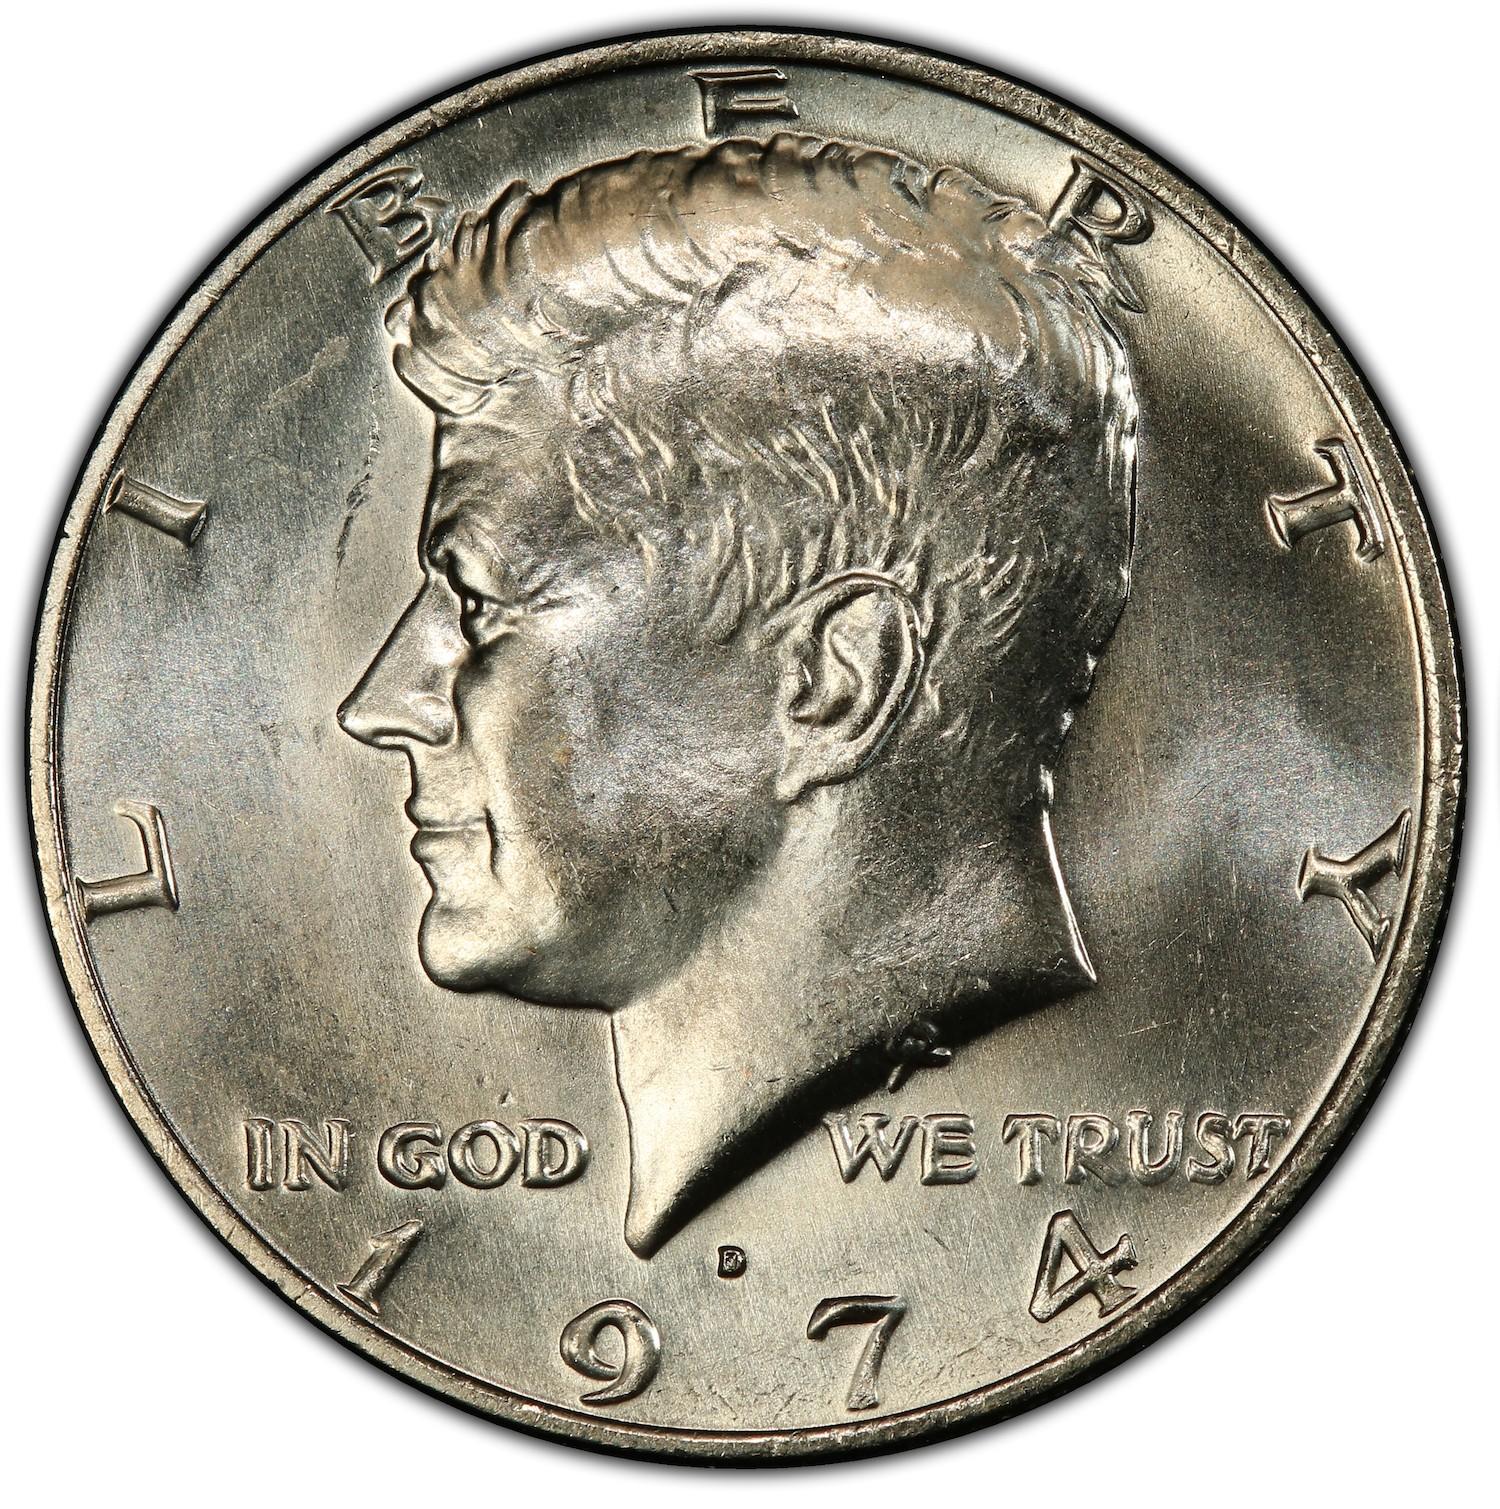 Valuable Kennedy Half Dollar Varieties : 1974 – World